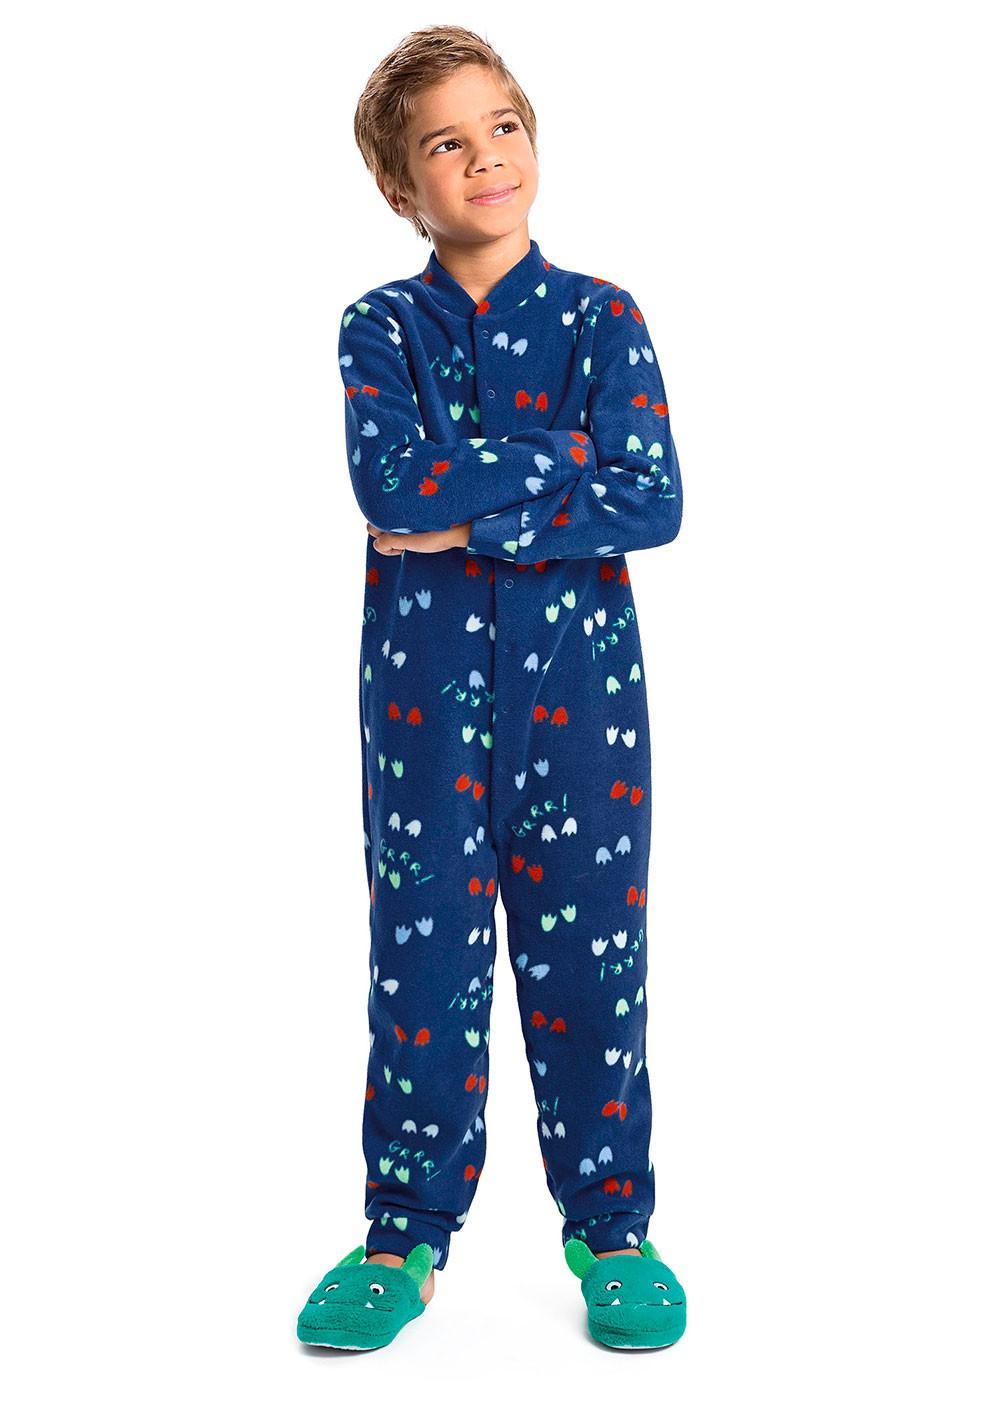 Pijama Infantil Masculino  Inverno Azul Pegadas  Malwee